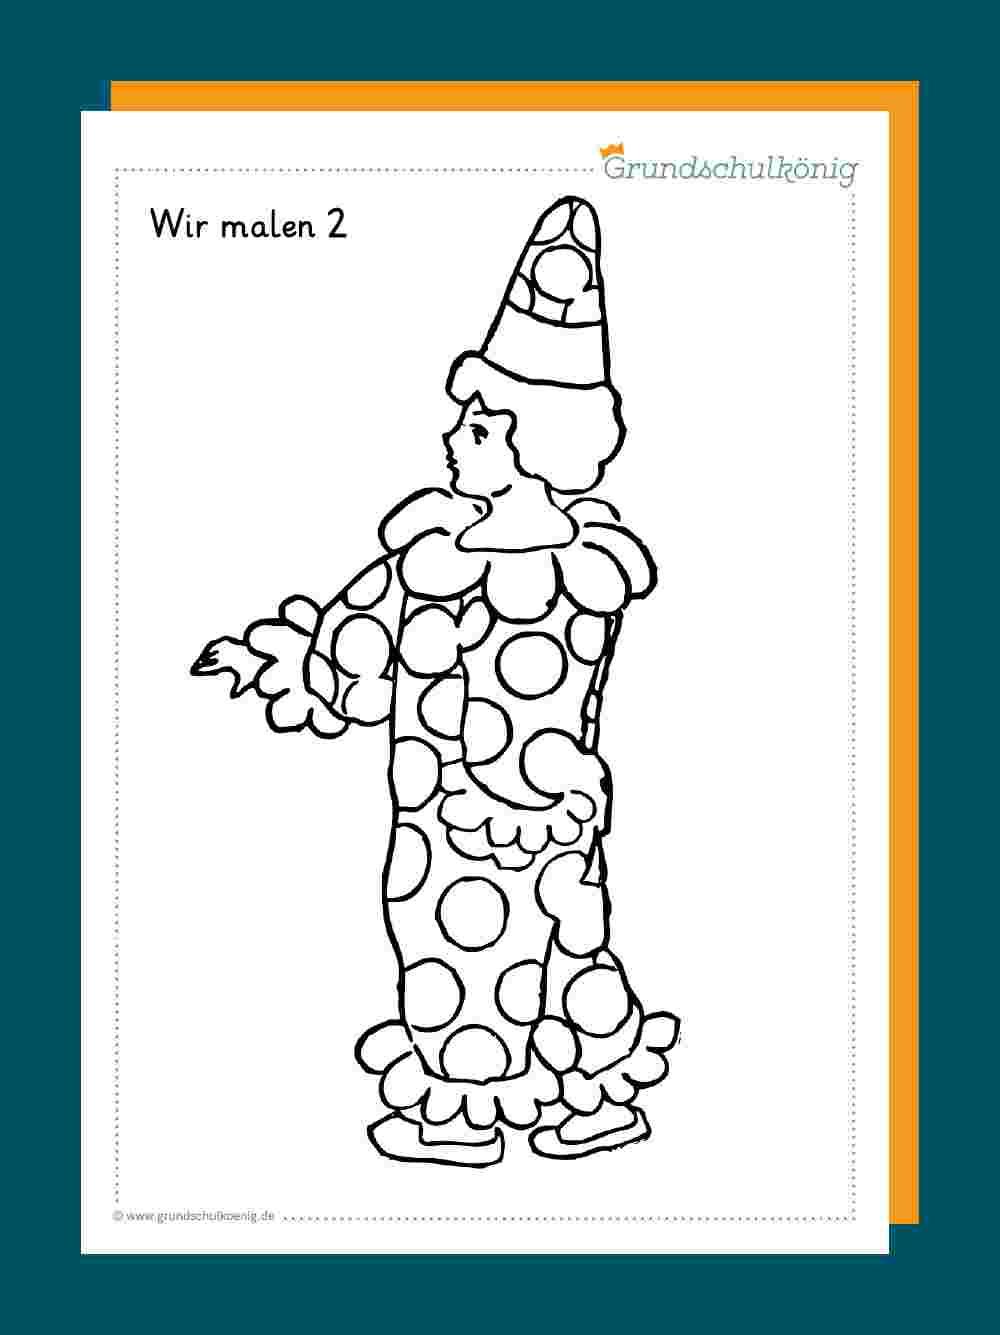 ausmalbilder 4 klasse  ausmalbild narzissen 4